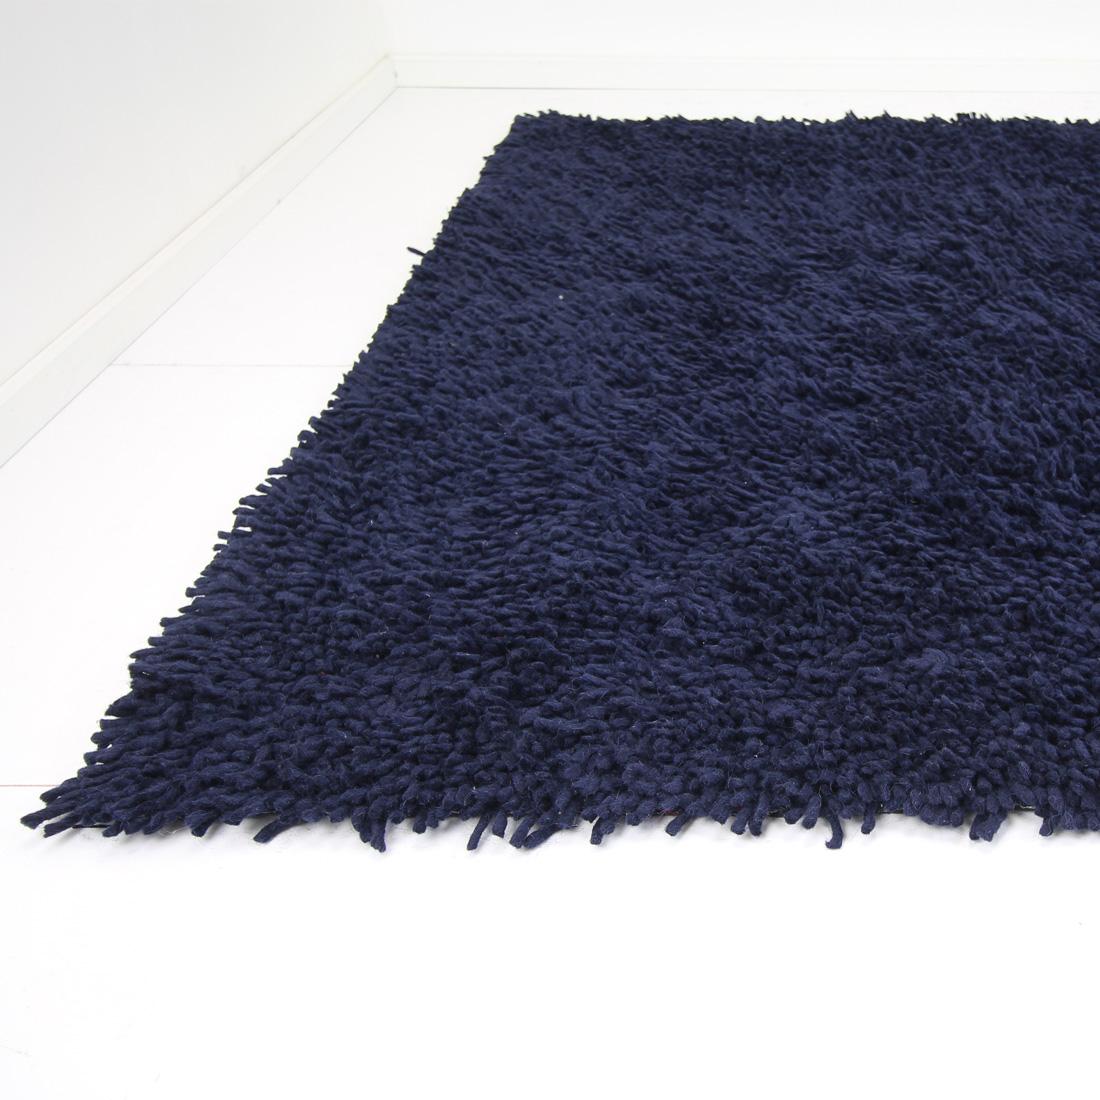 Vloerkleed Salsa (wol) Blauw